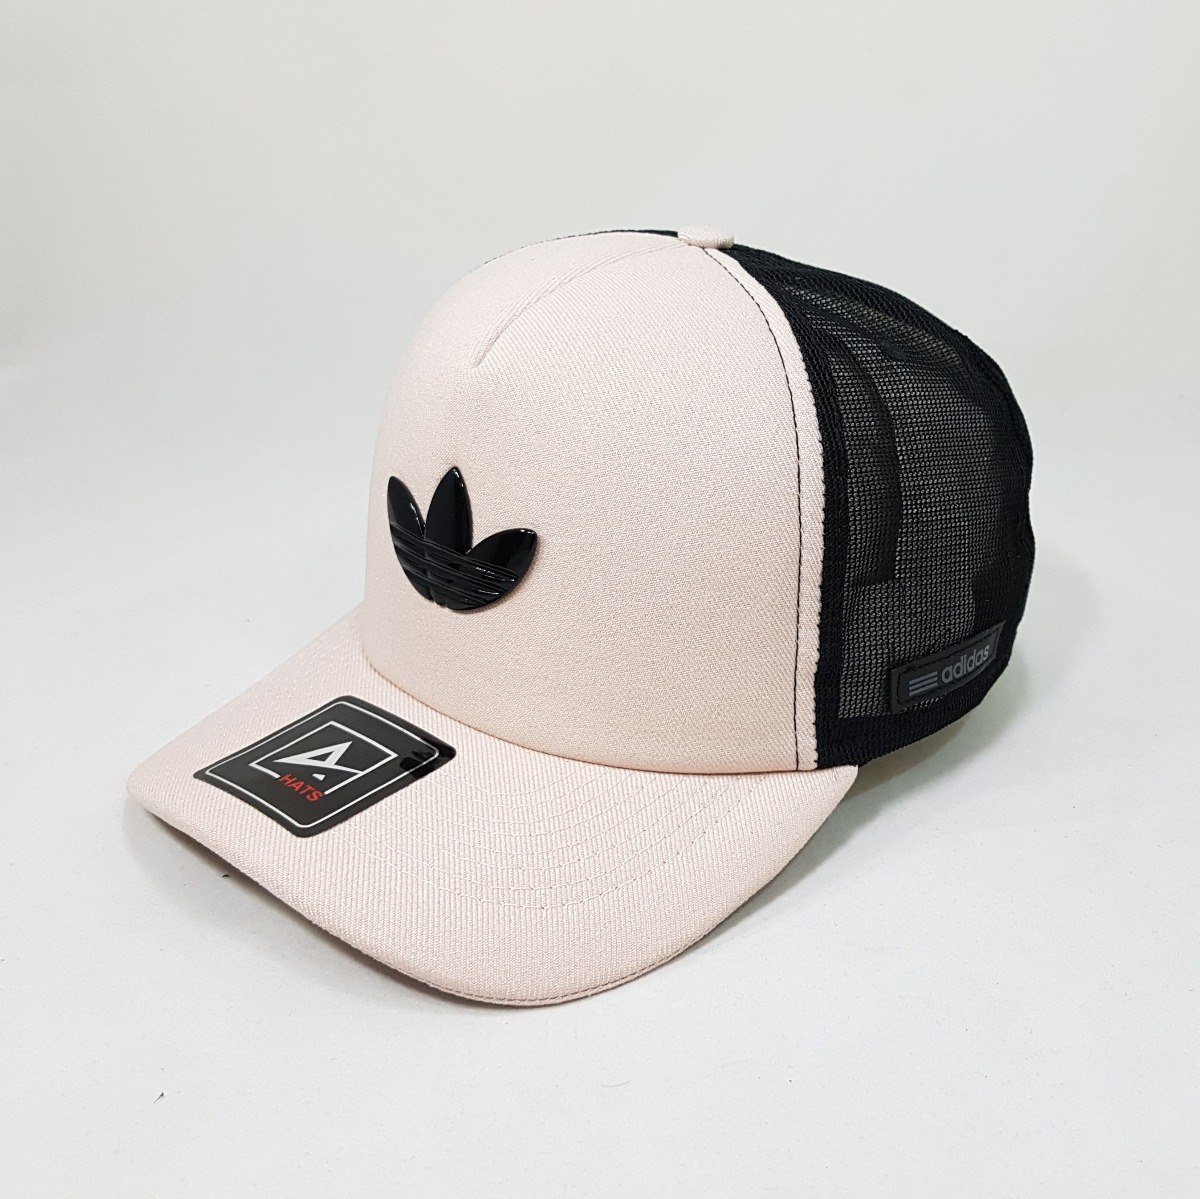 32eff62246 boné aba curva snapback telinha trucker adidas rosa. Carregando zoom.